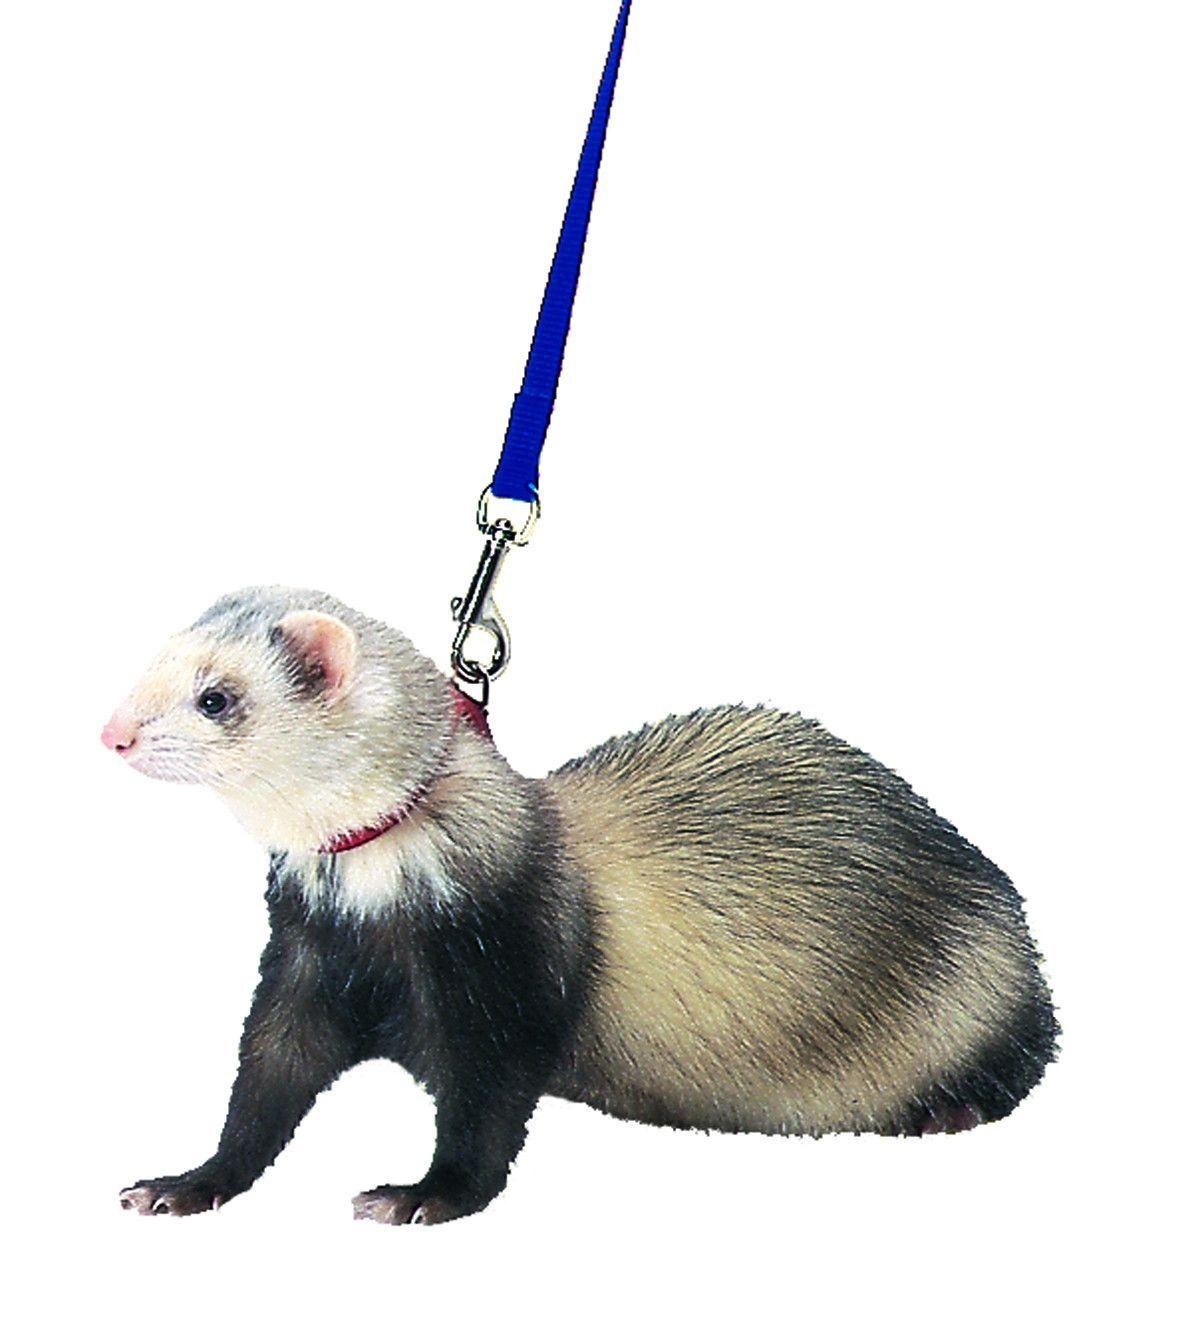 FERRET HARNESS AND LEAD | Small-Animals | Pinterest | Ferret, Small ...